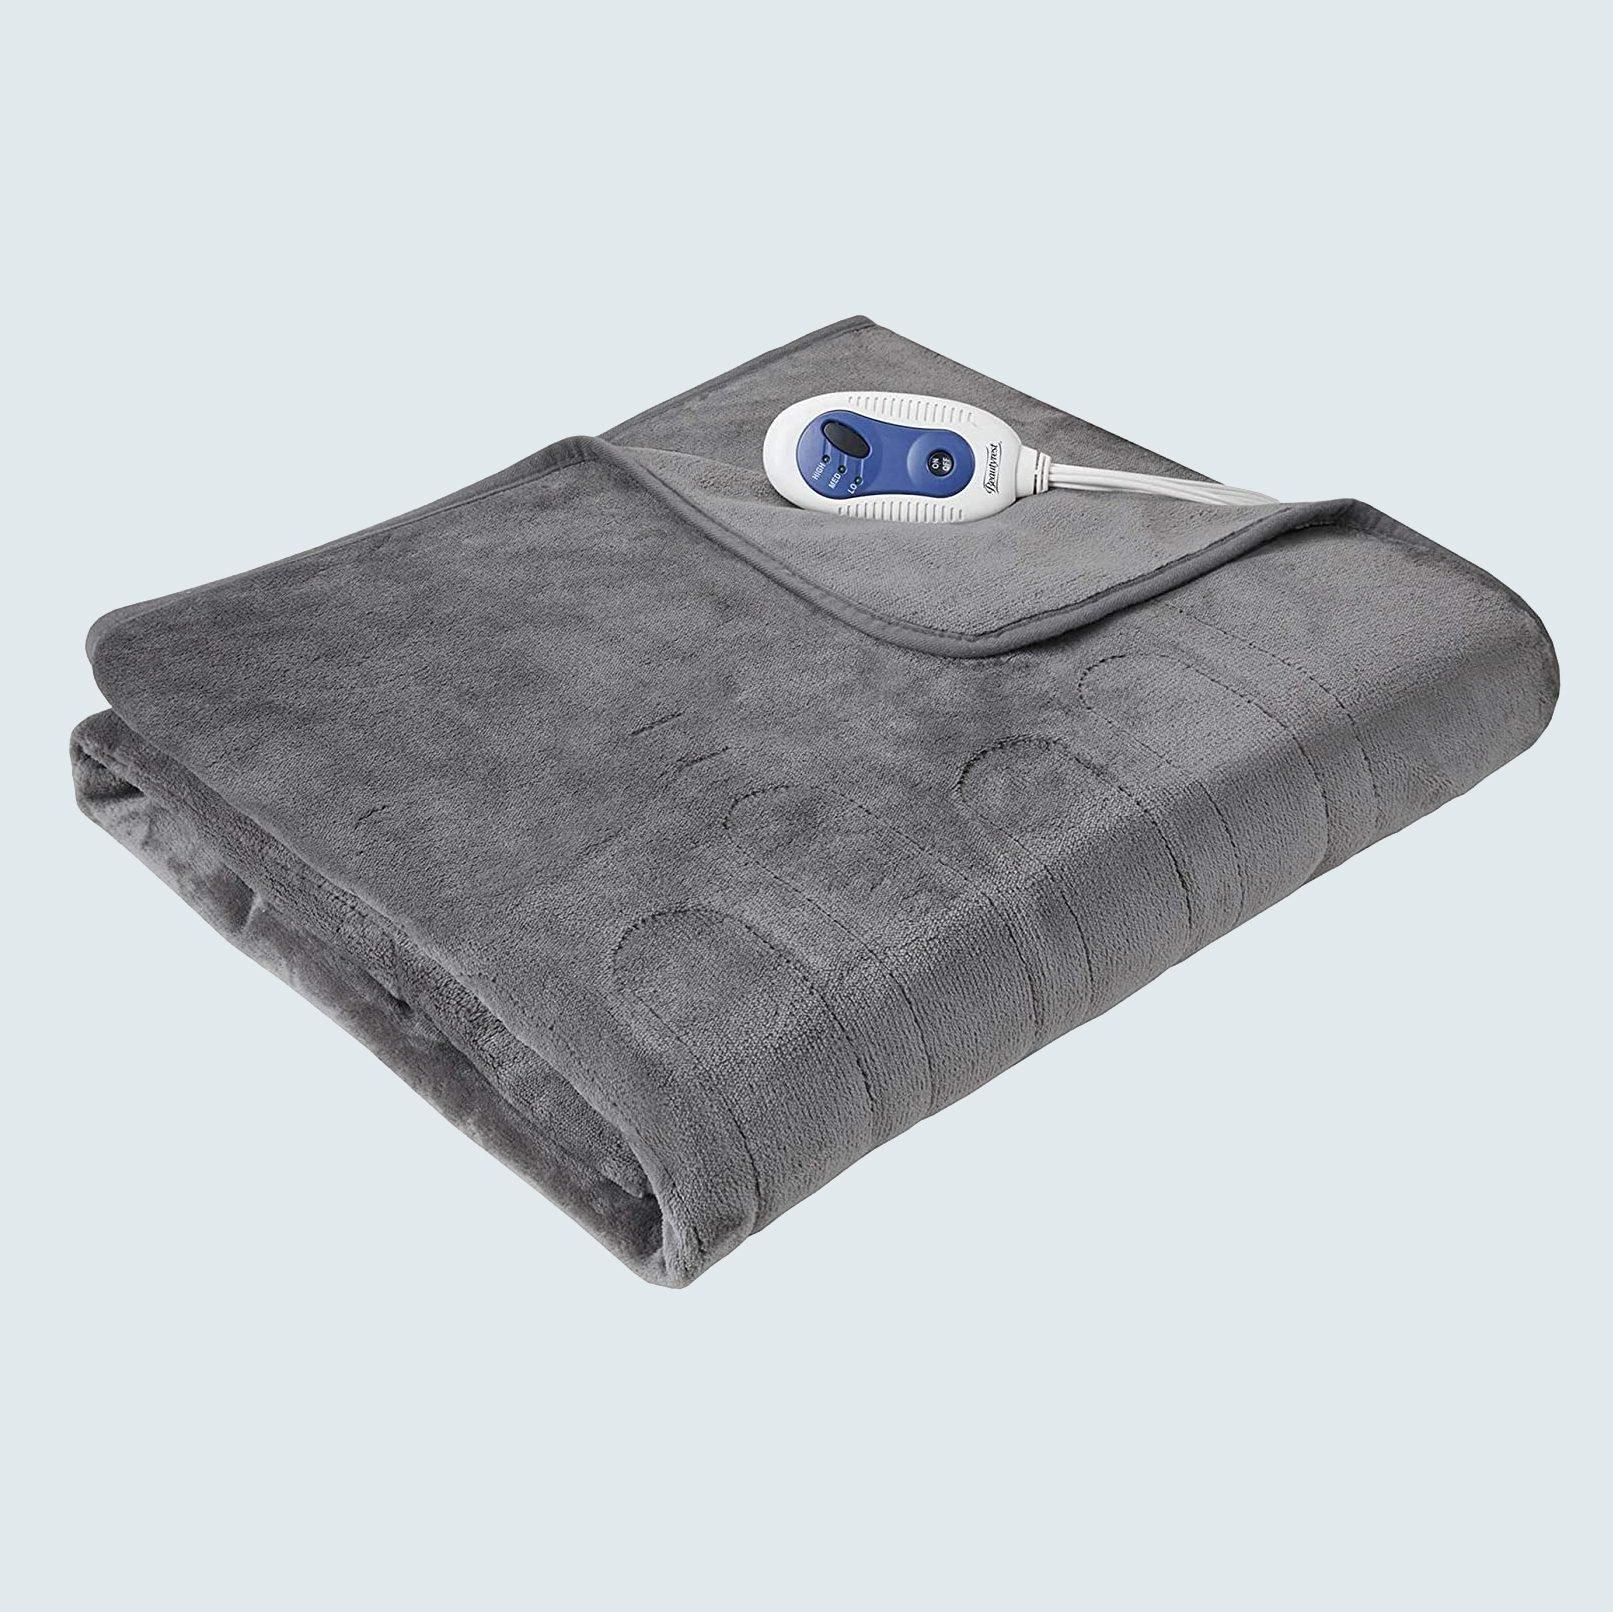 Beautyrest Foot Pocket Electric Blanket